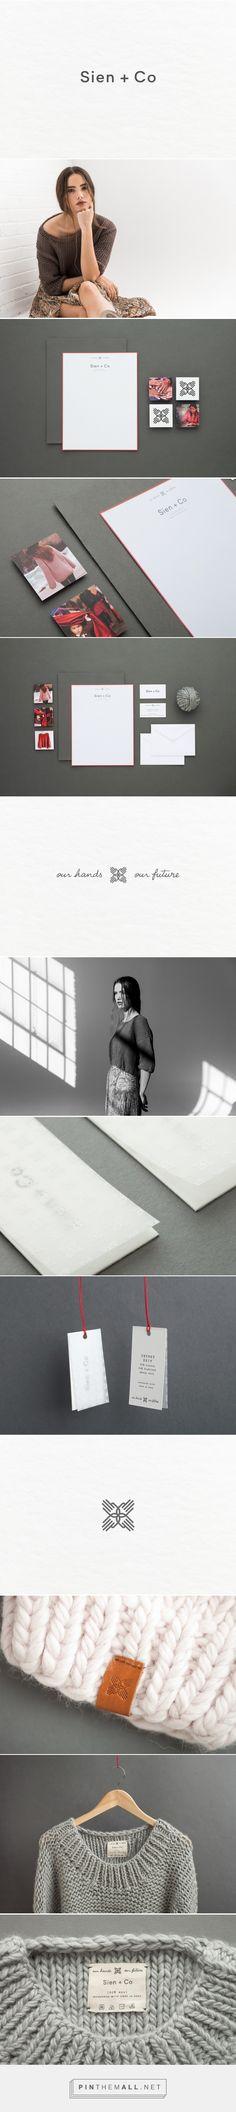 Sien + Co Knit Apparel Branding by Menta   Fivestar Branding Agency – Design and Branding Agency & Curated Inspiration Gallery #fashion #fashionbranding #branding #design #designinspiration